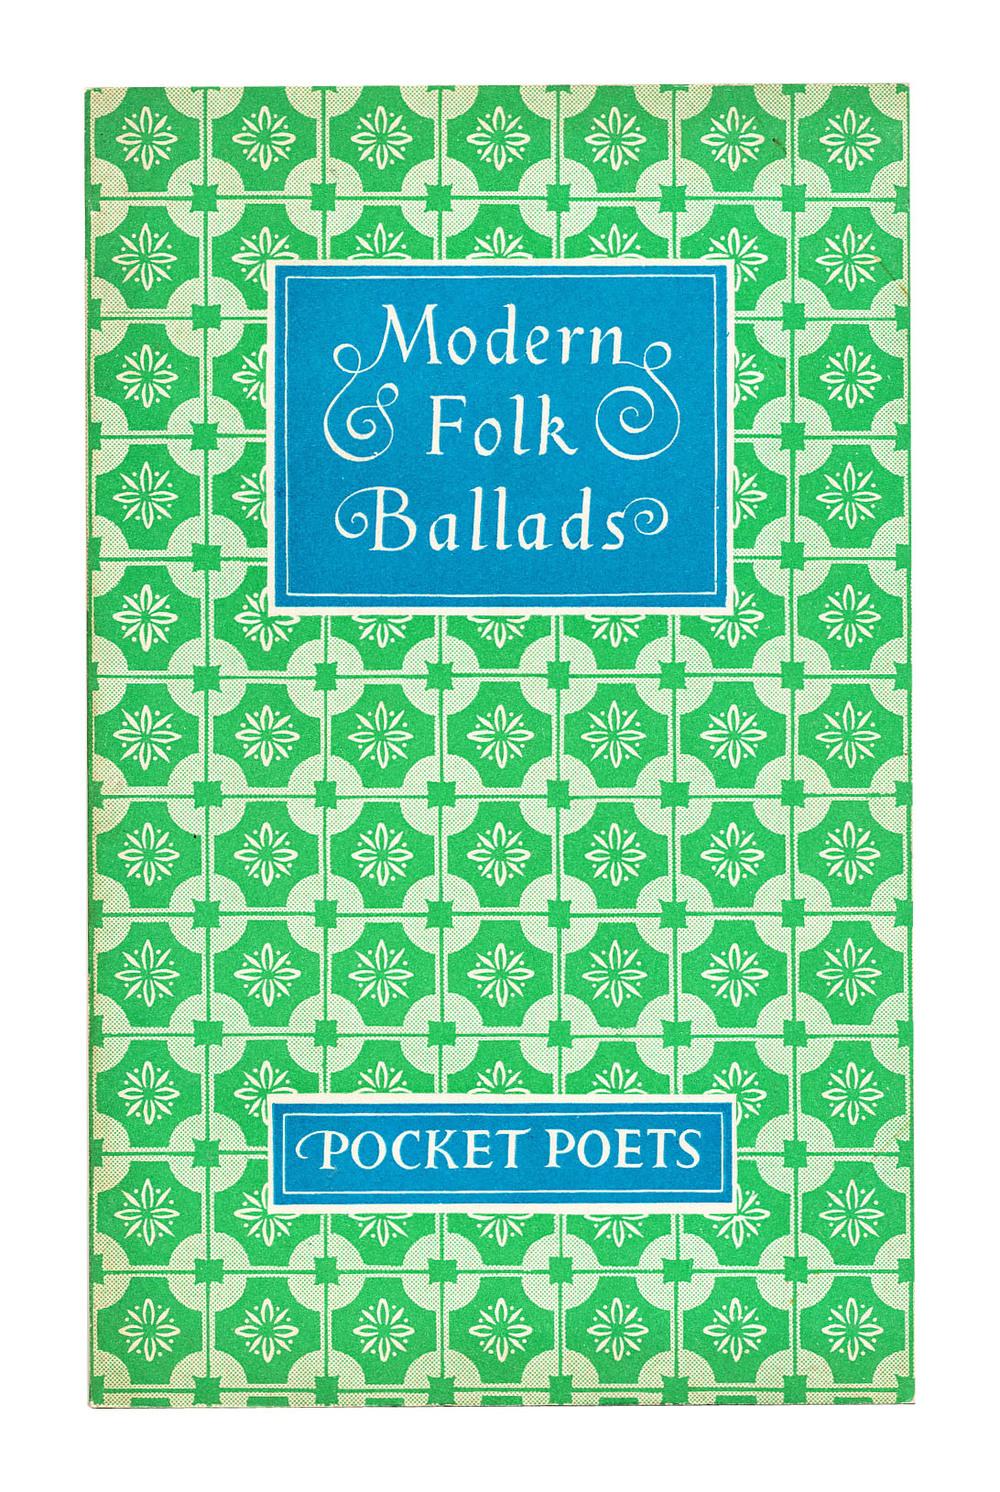 Modern Folk Ballads cover.jpg